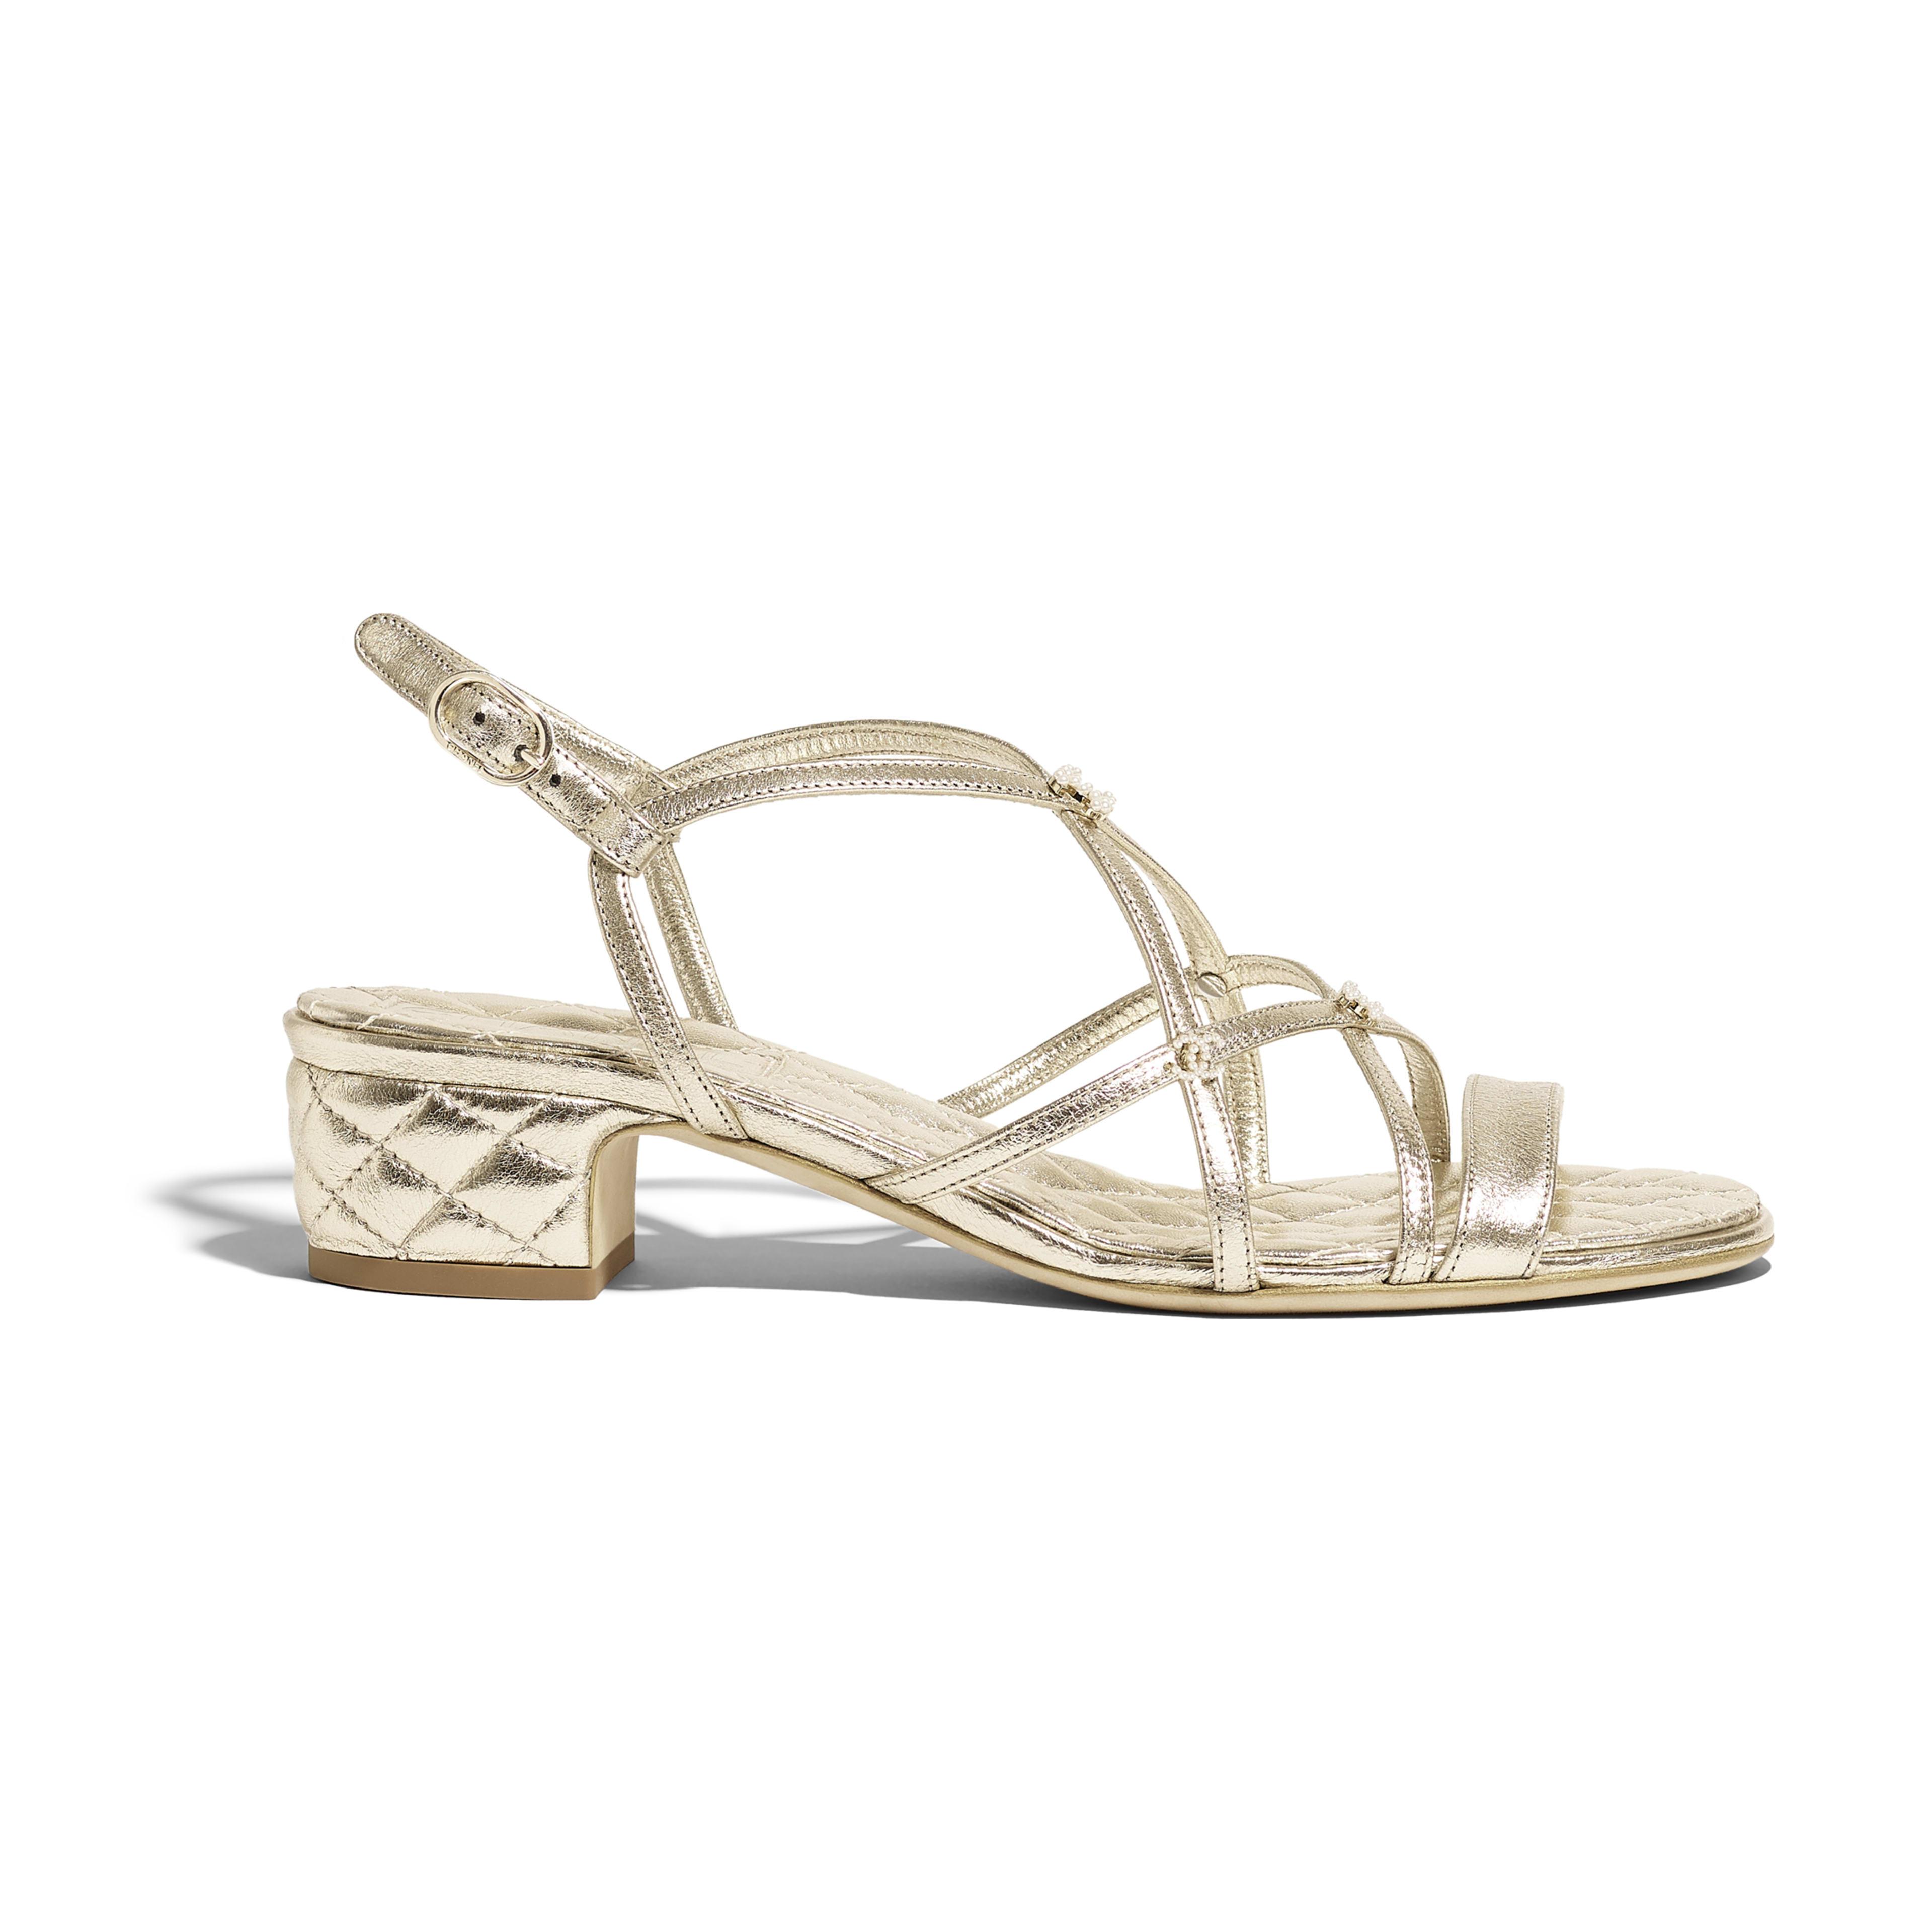 3dd729551739 Sandals gold laminated lambskin laminated lambskin packshot default jpg  3840x3840 Gold sandals